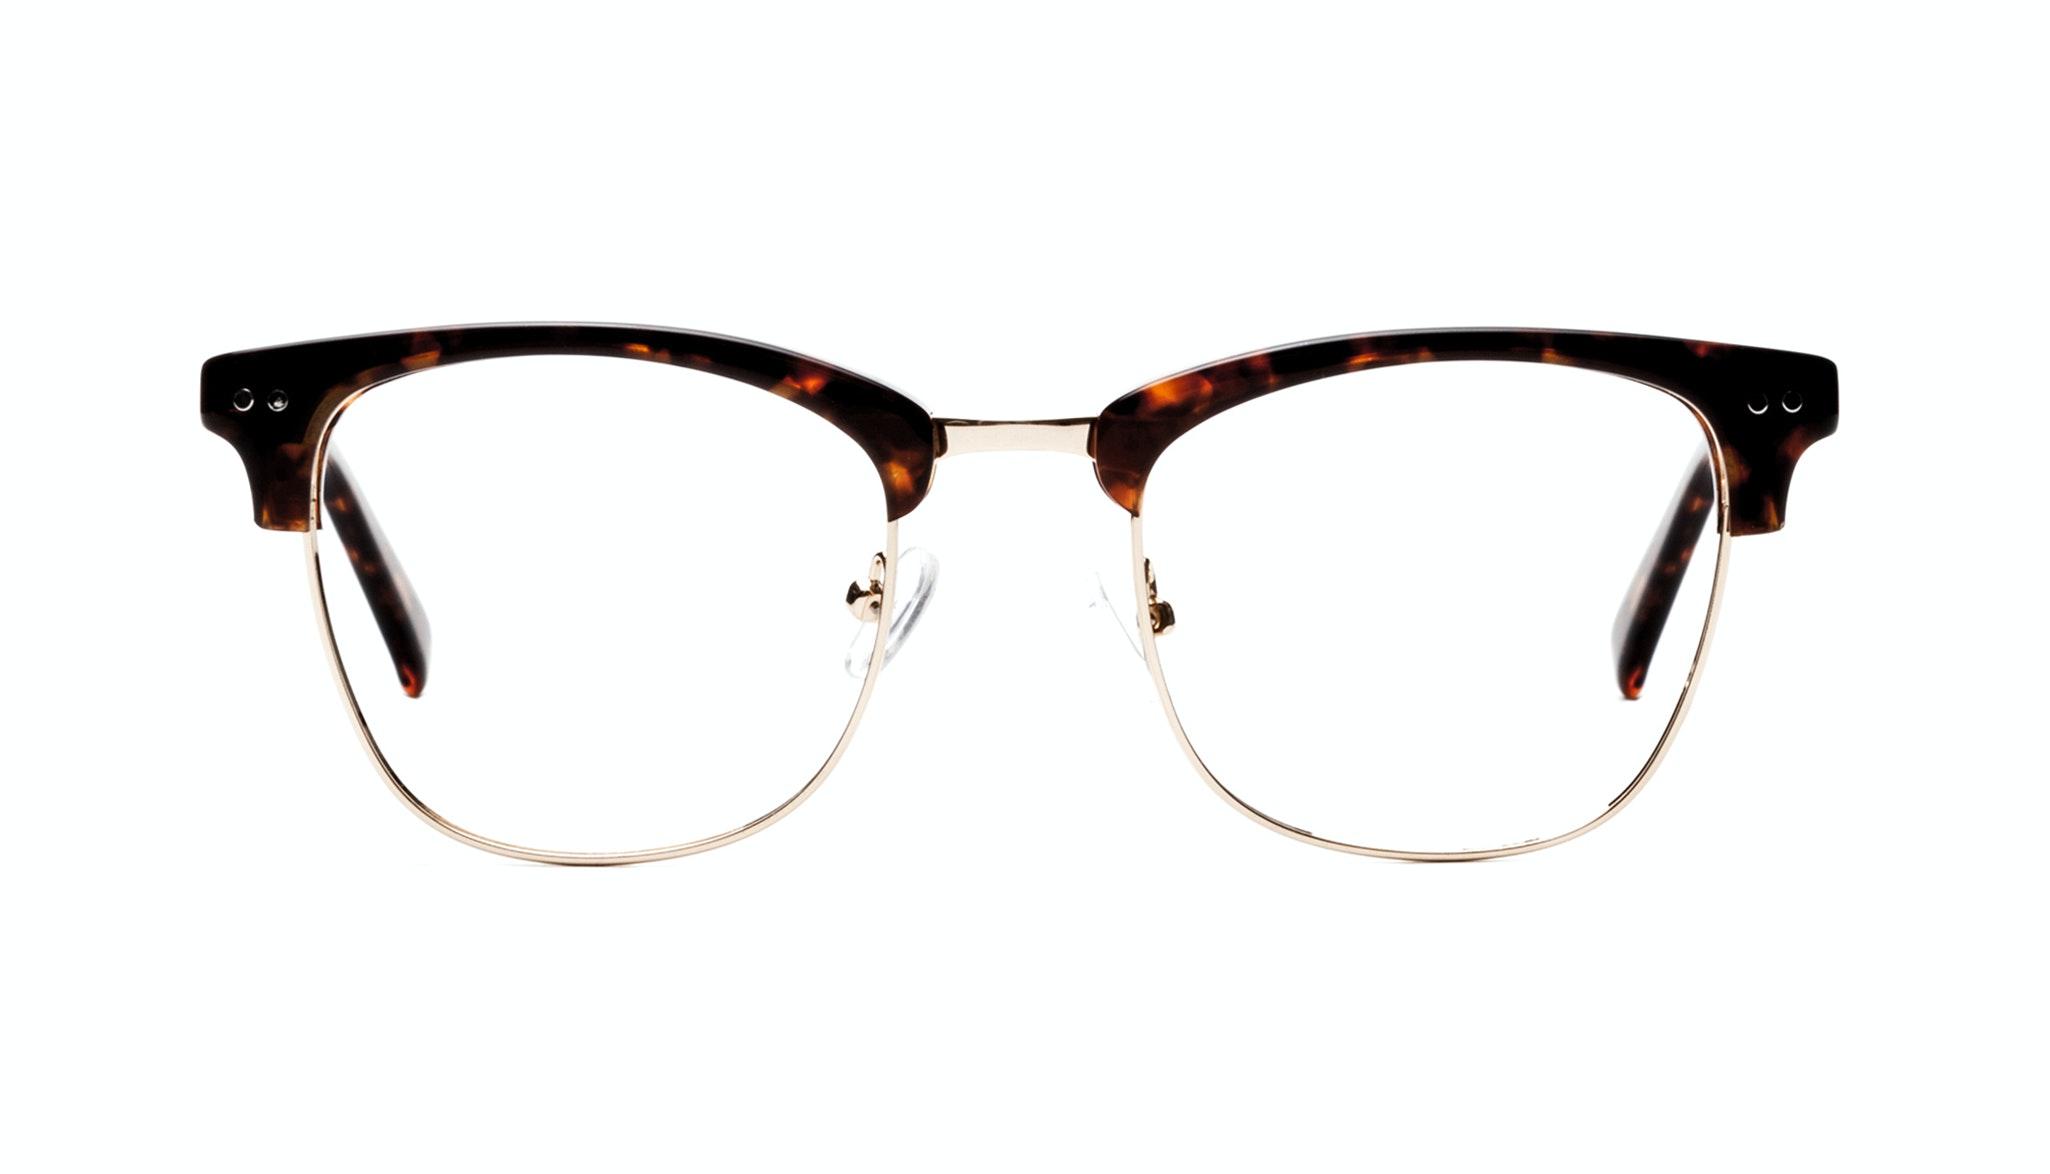 Affordable Fashion Glasses Square Eyeglasses Men Lift Gold Sepia Front